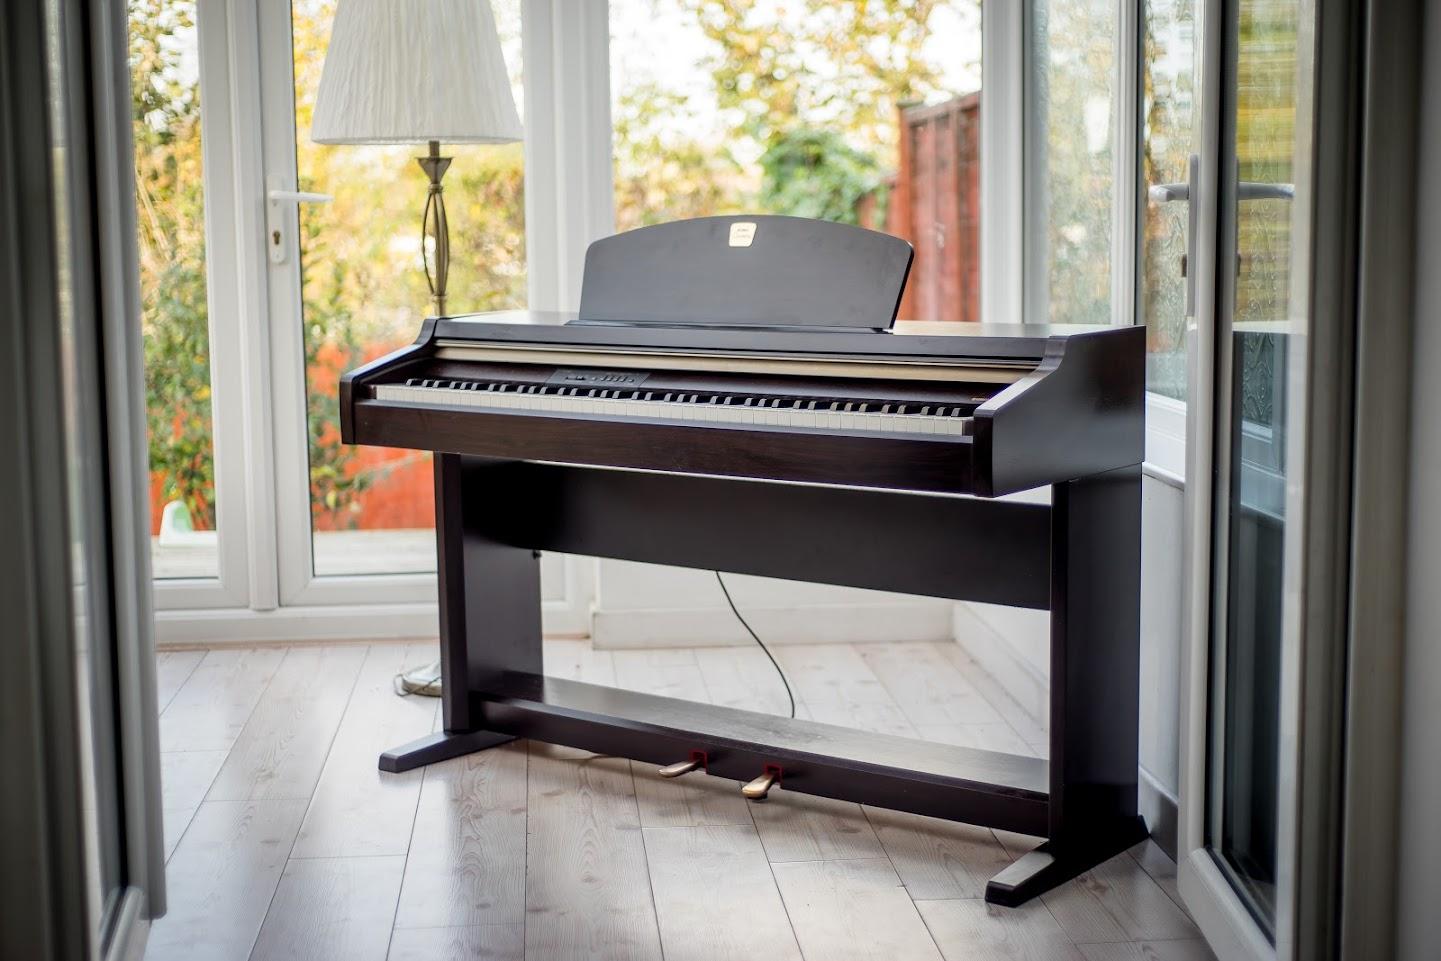 yamaha clavinova full size digital piano 88 keys notes weighted keyboard deliver ebay. Black Bedroom Furniture Sets. Home Design Ideas